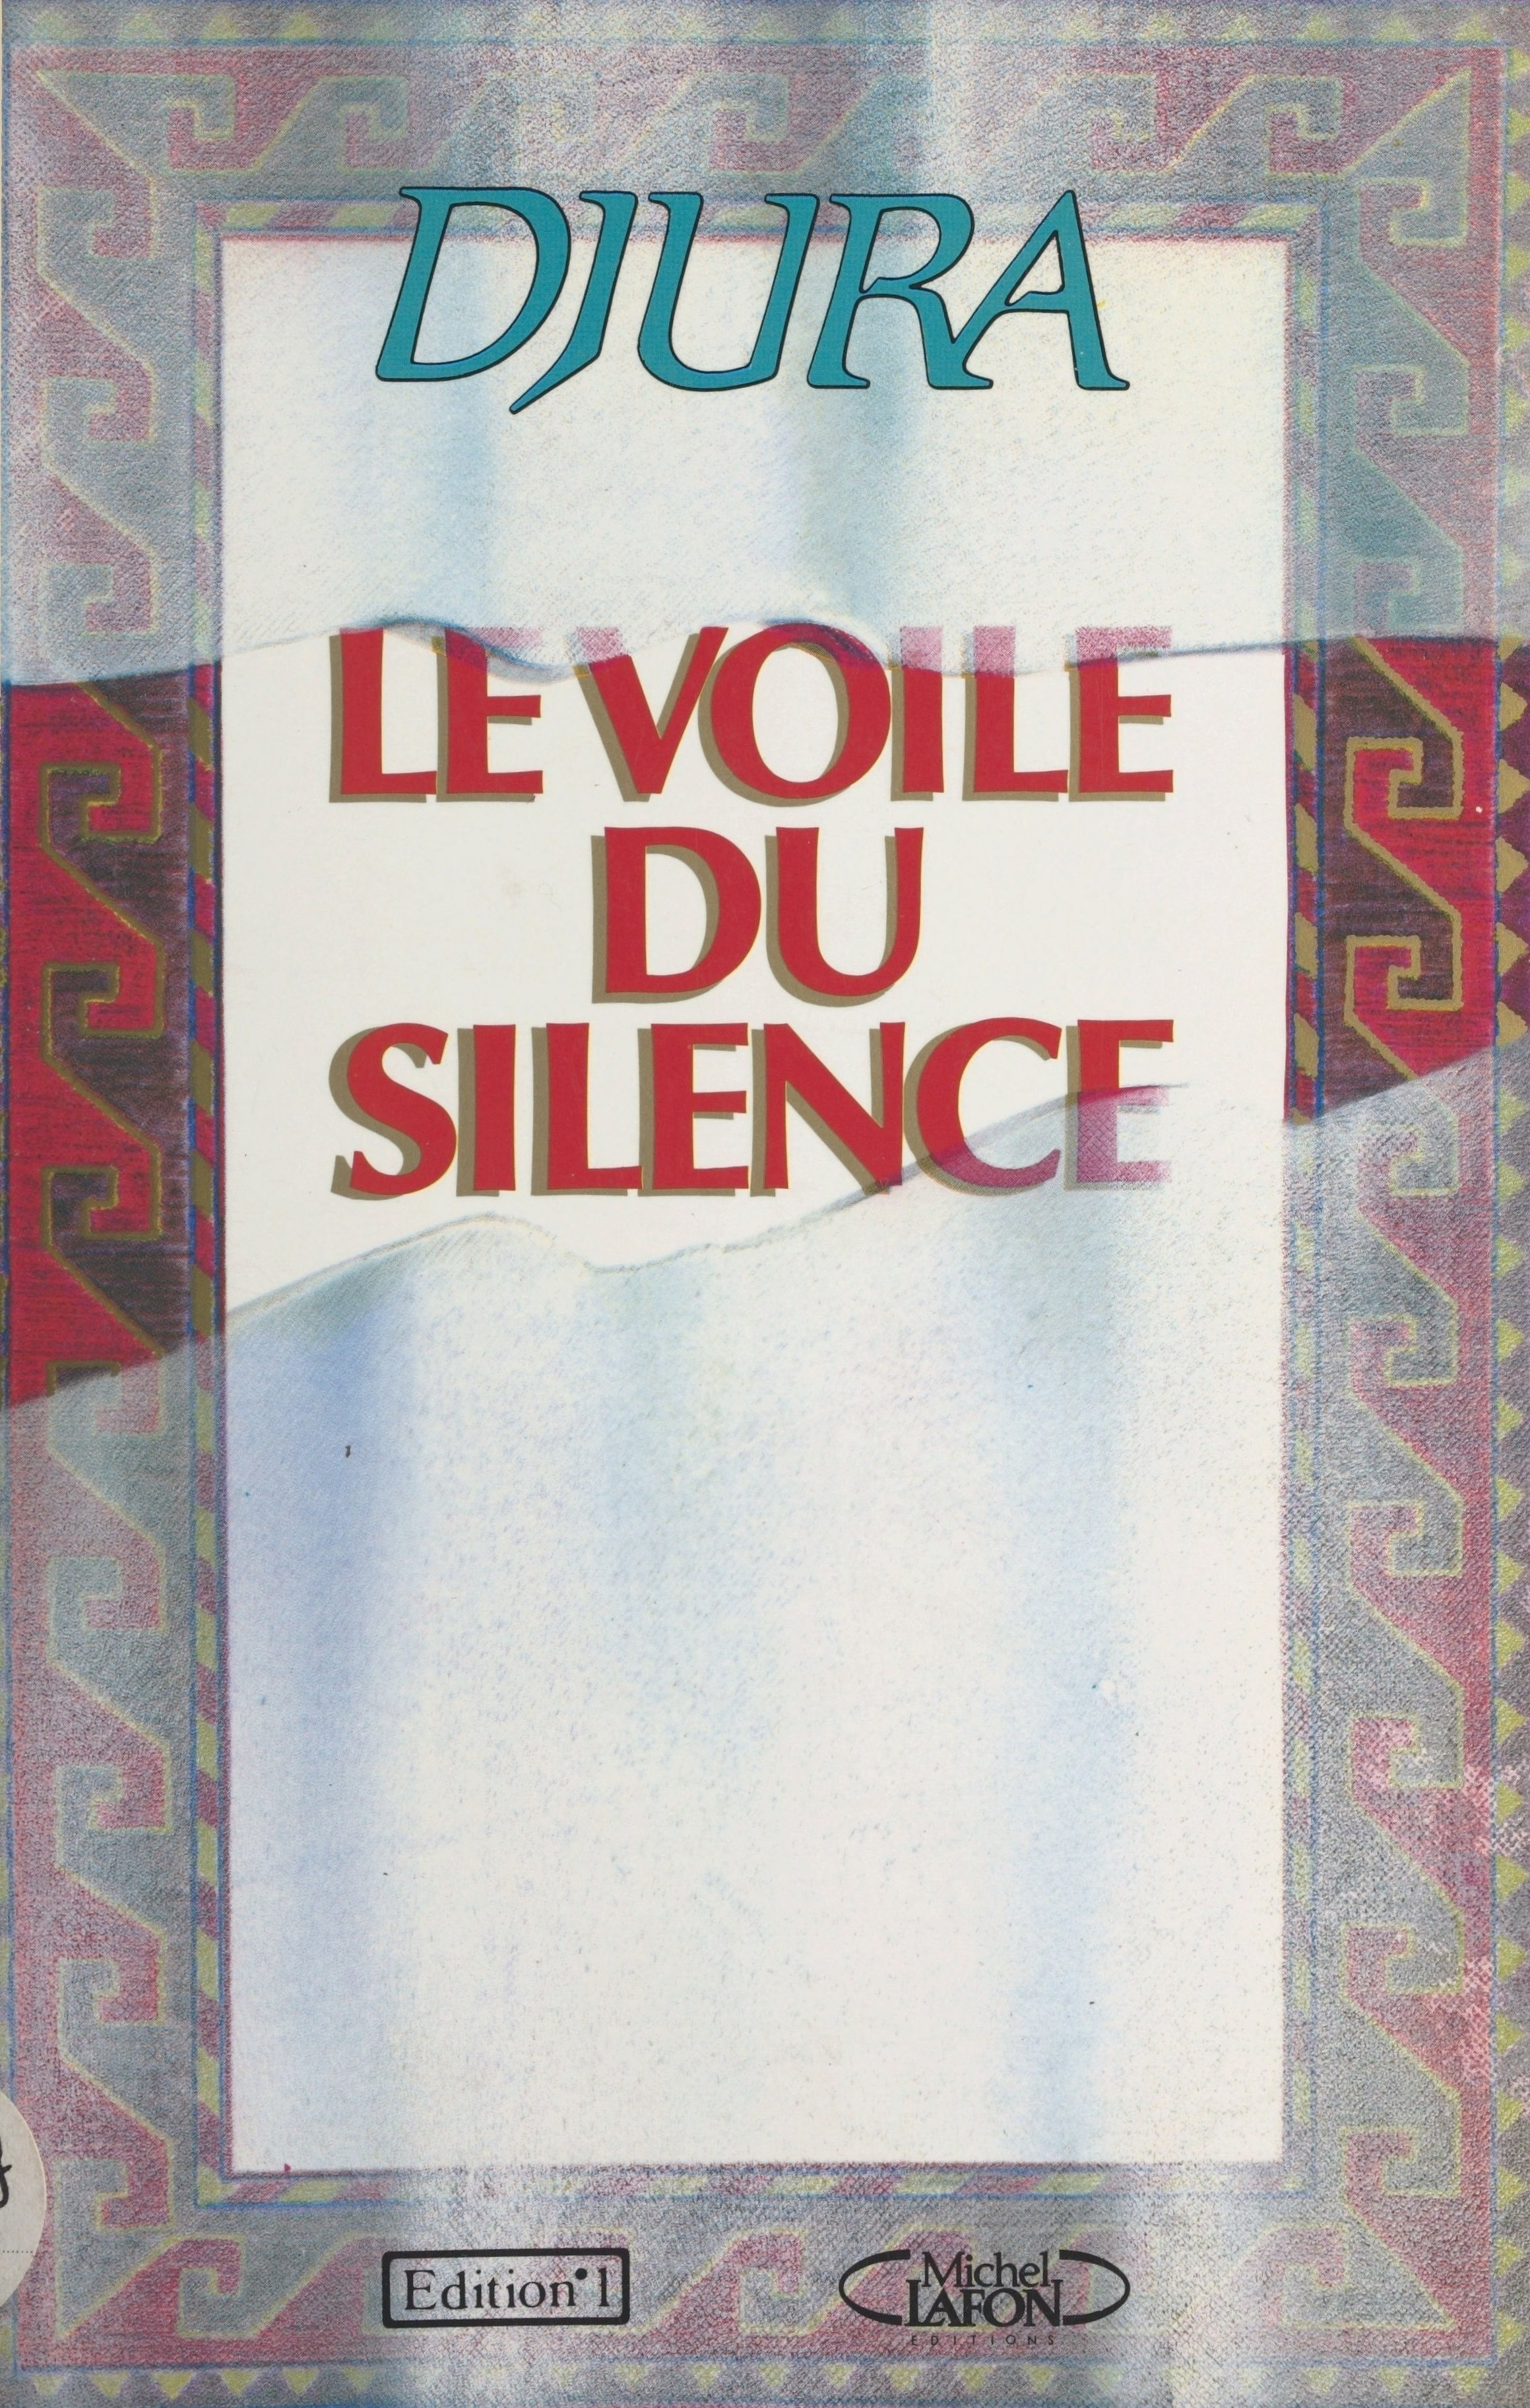 Le voile du silence